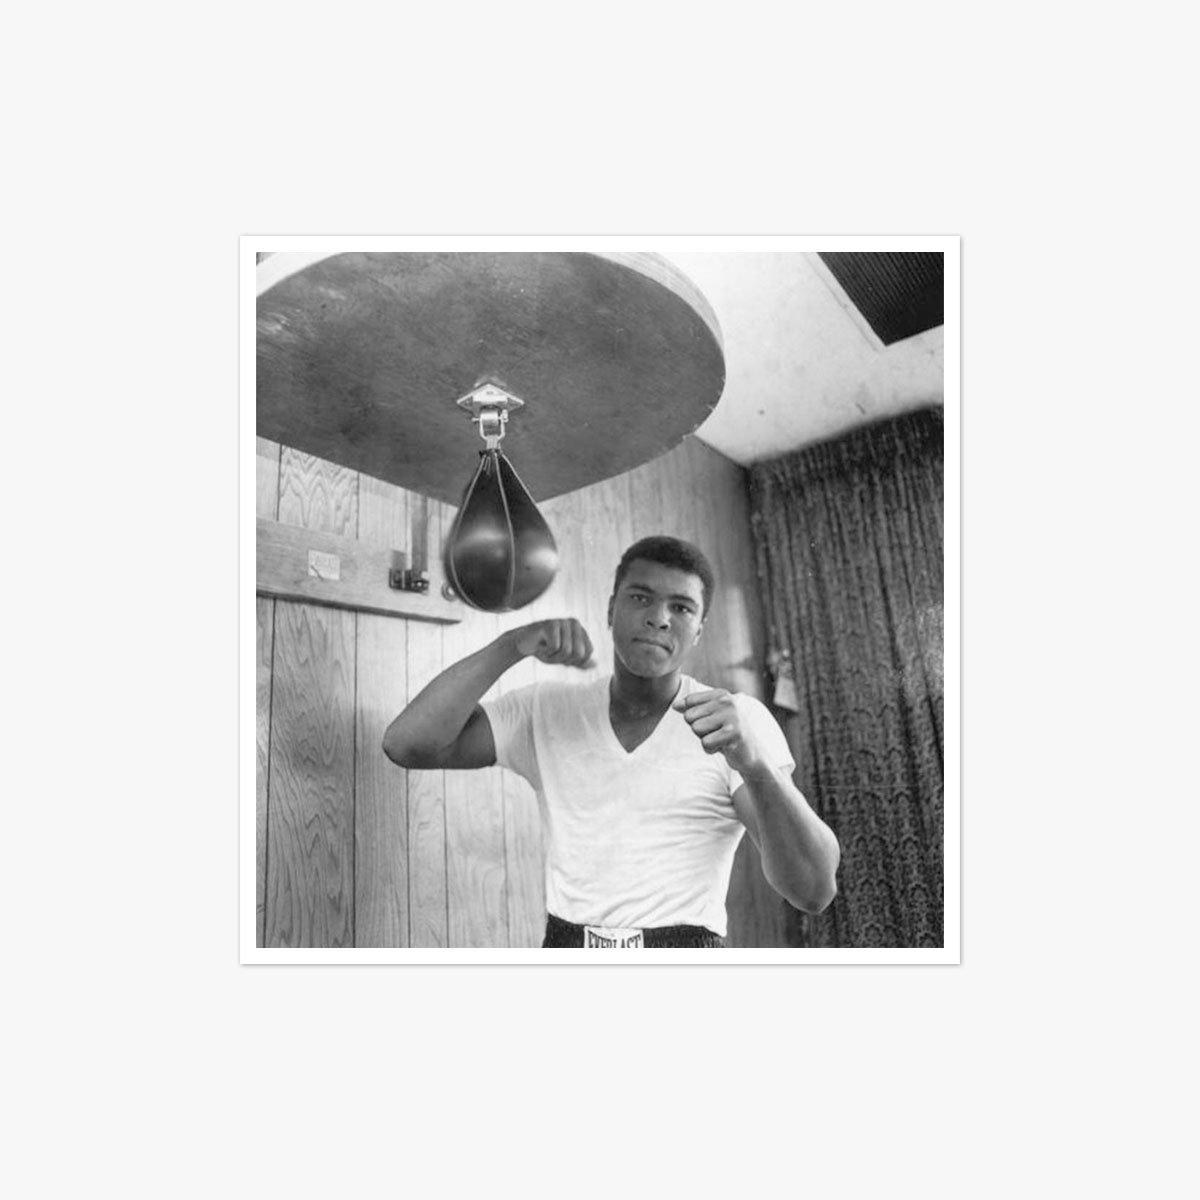 Ali In Training by Harry Benson